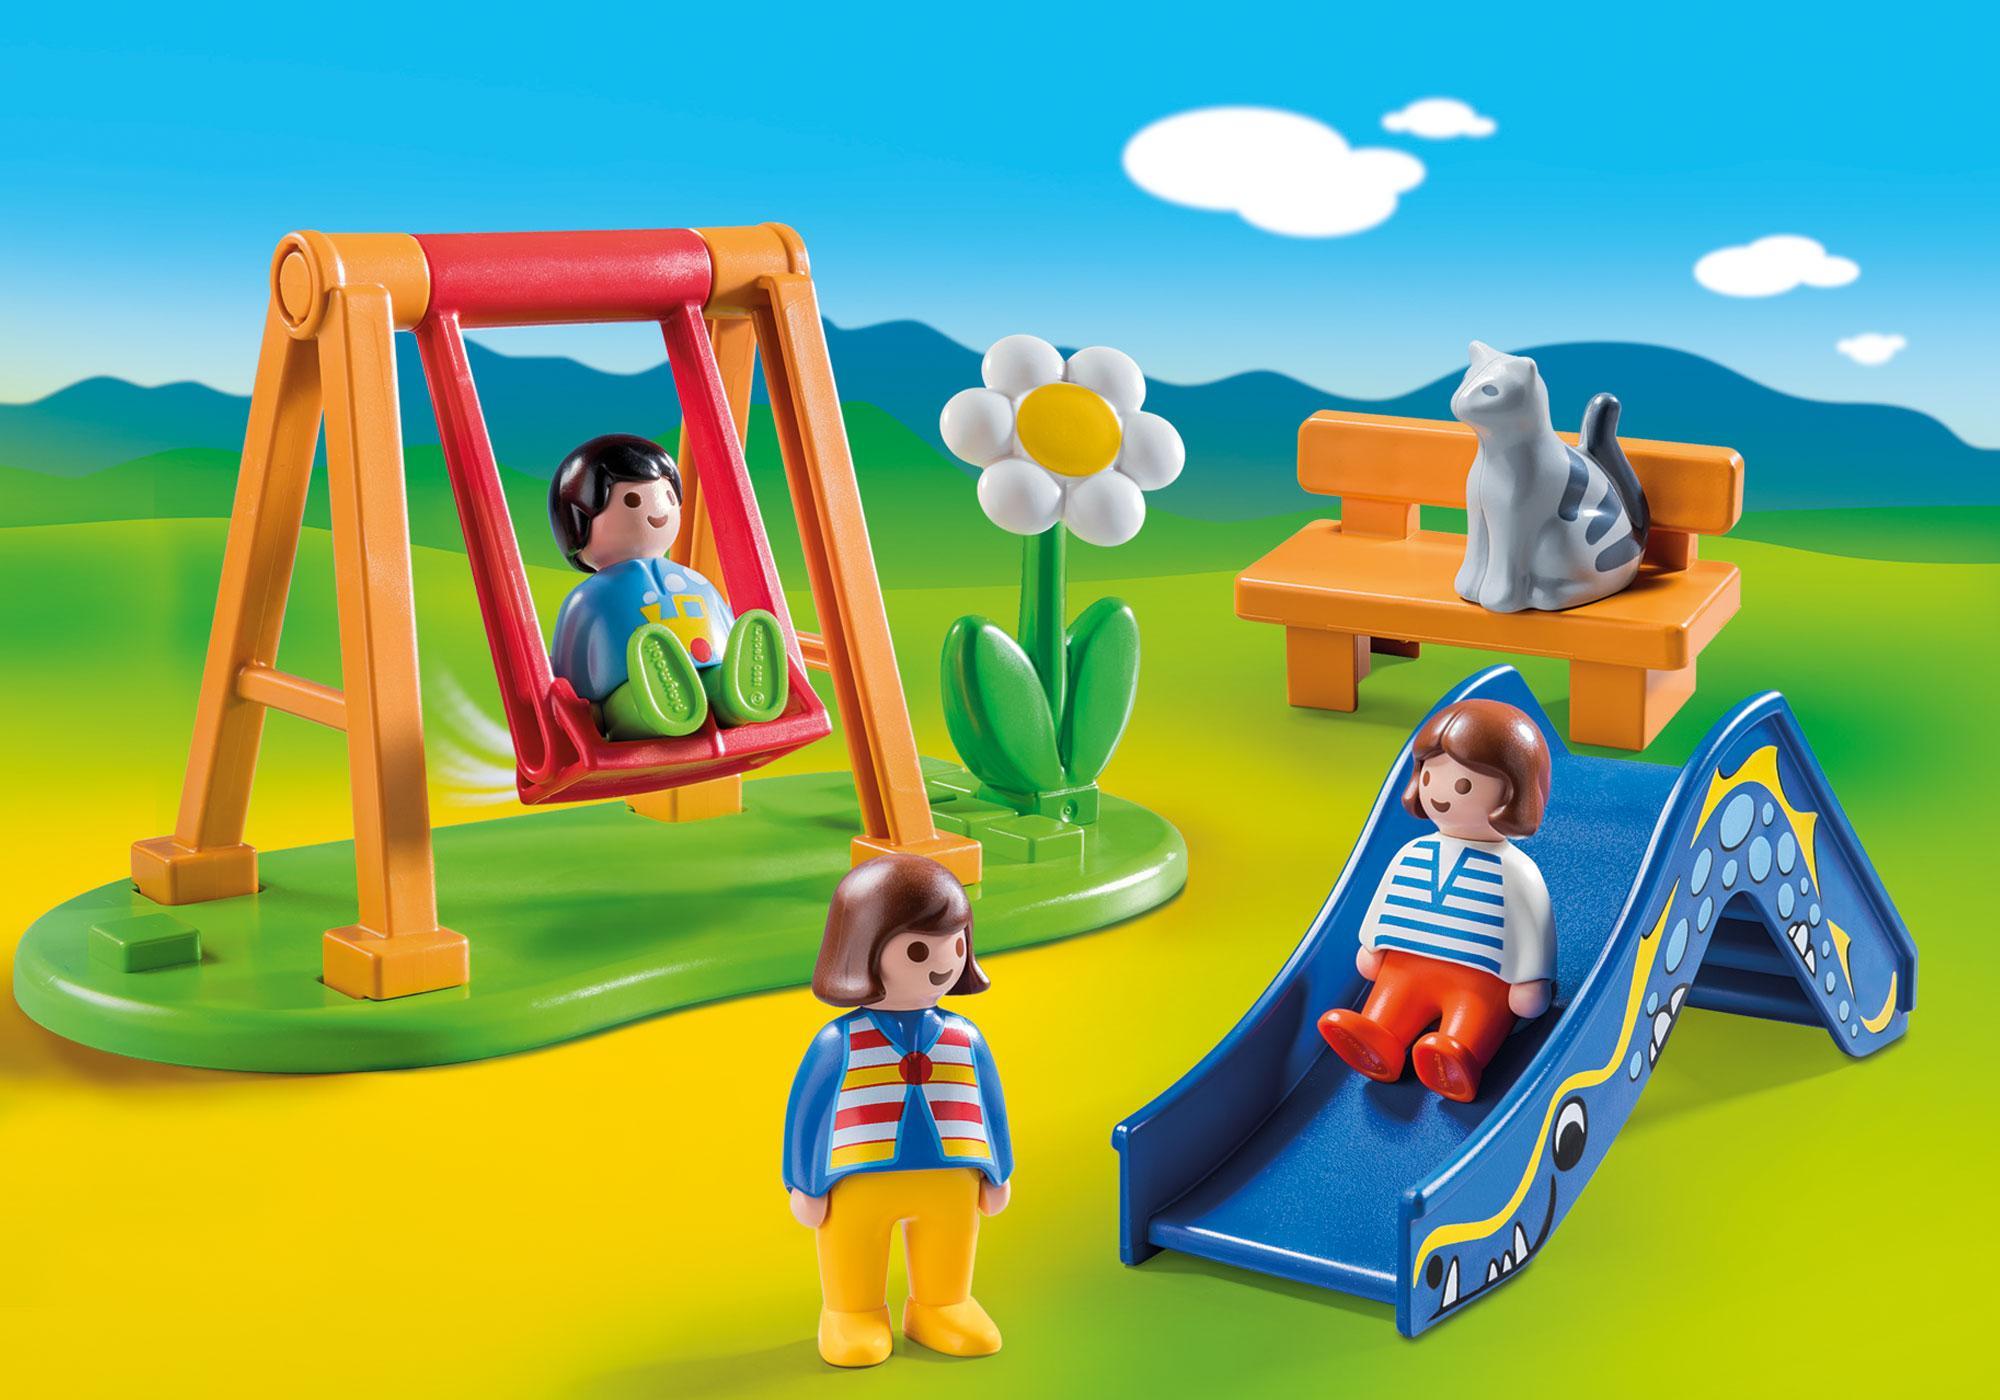 70130_product_detail/Children's Playground